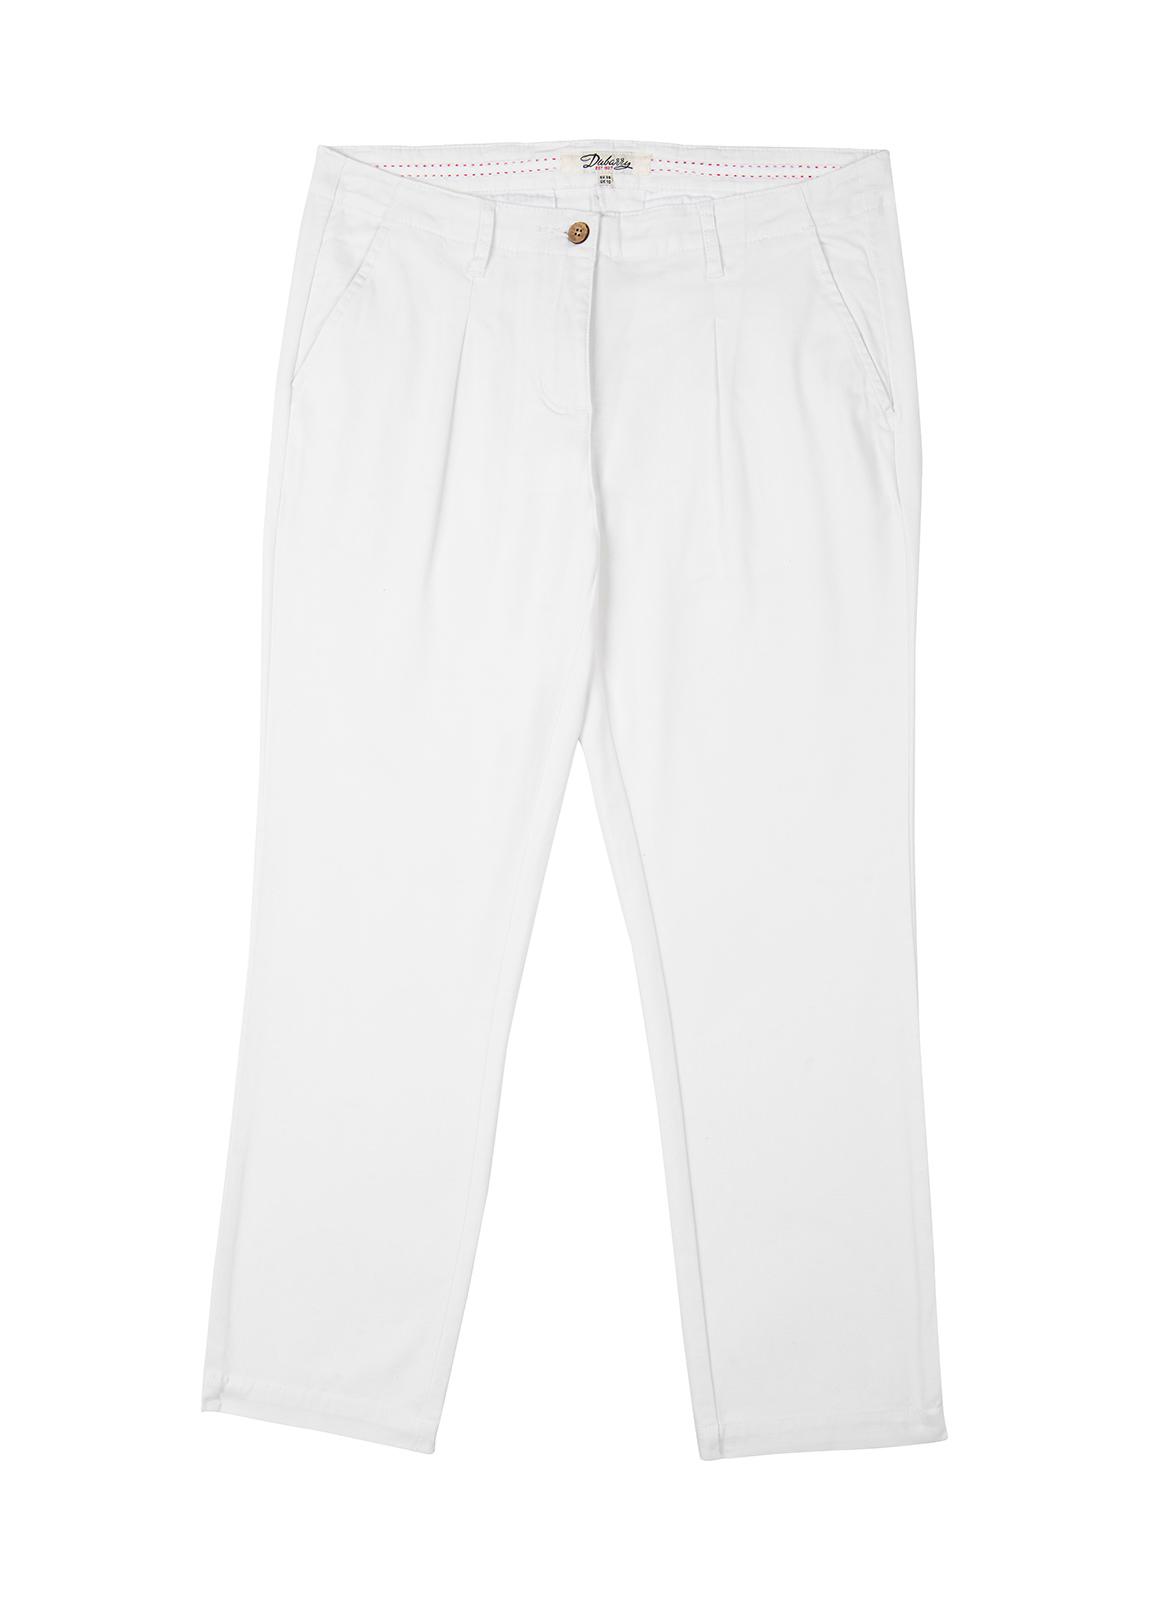 Reed Capri Trousers - White